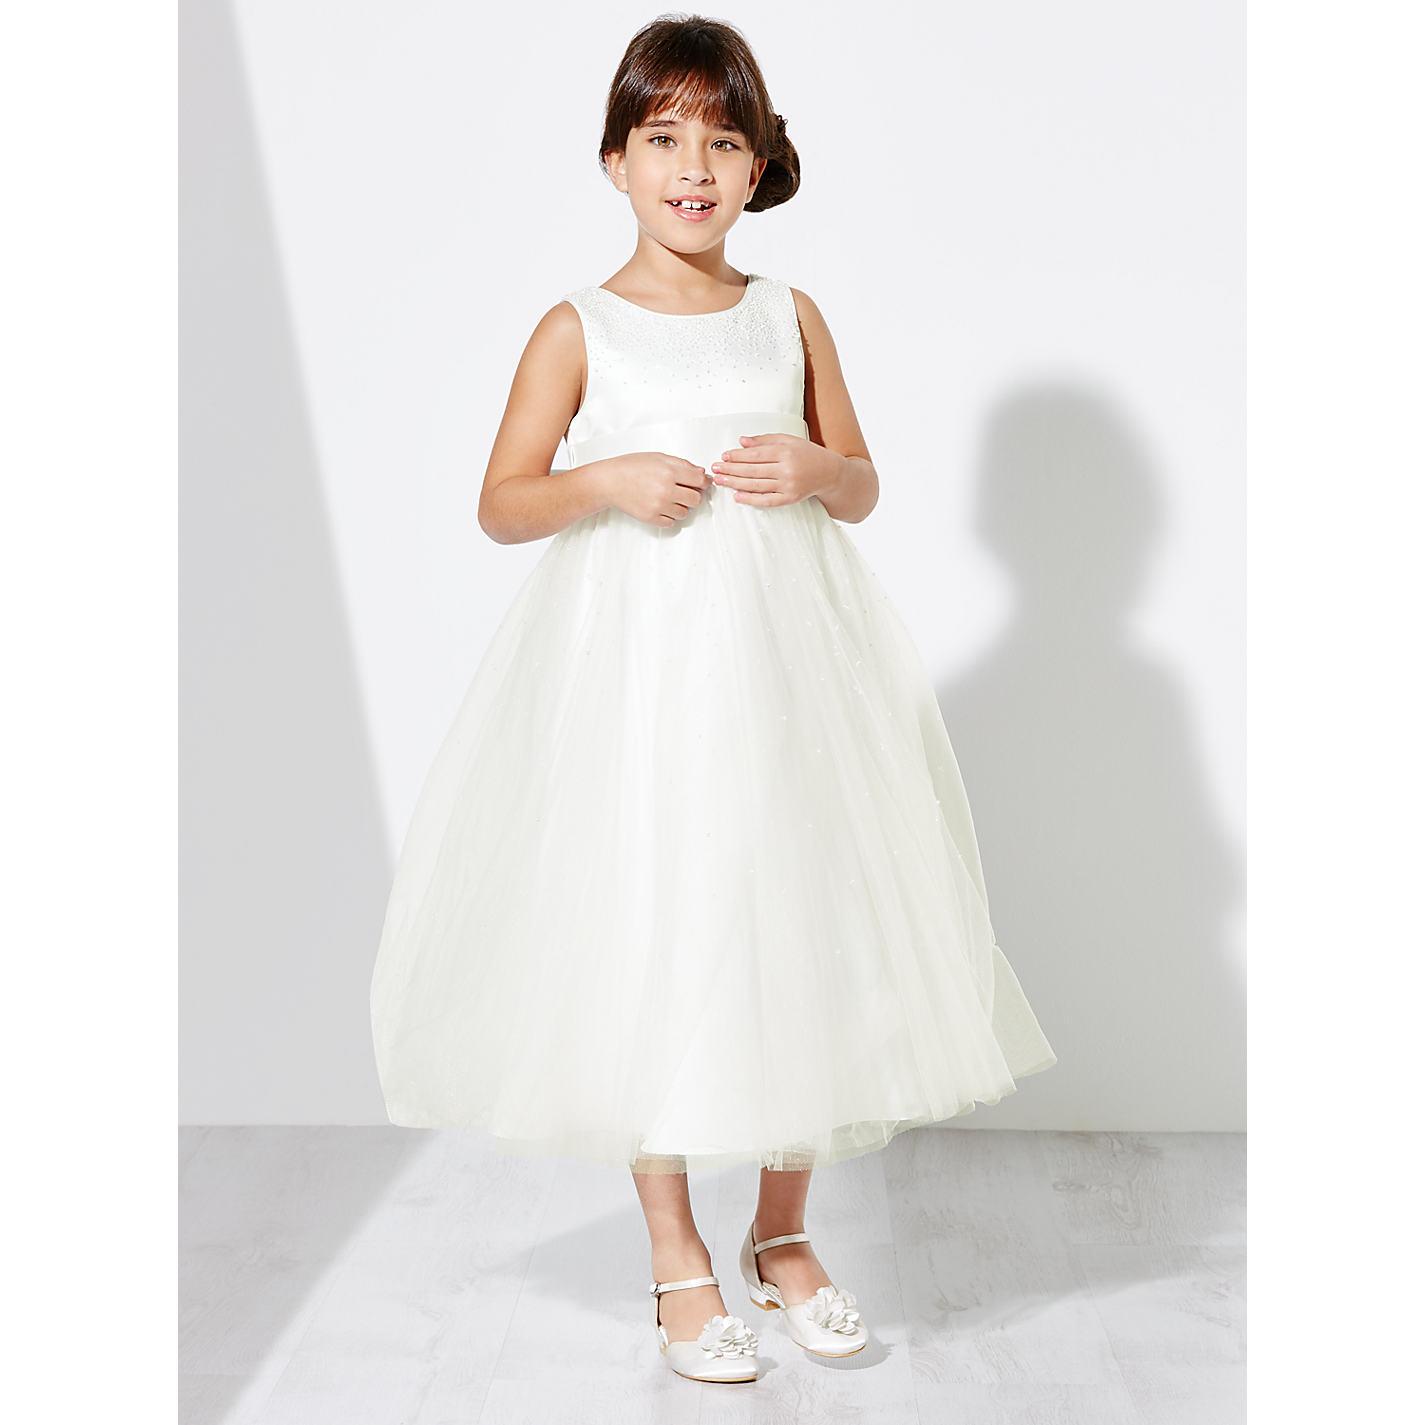 Bridesmaid dresses uk john lewis high cut wedding dresses for John lewis wedding dresses